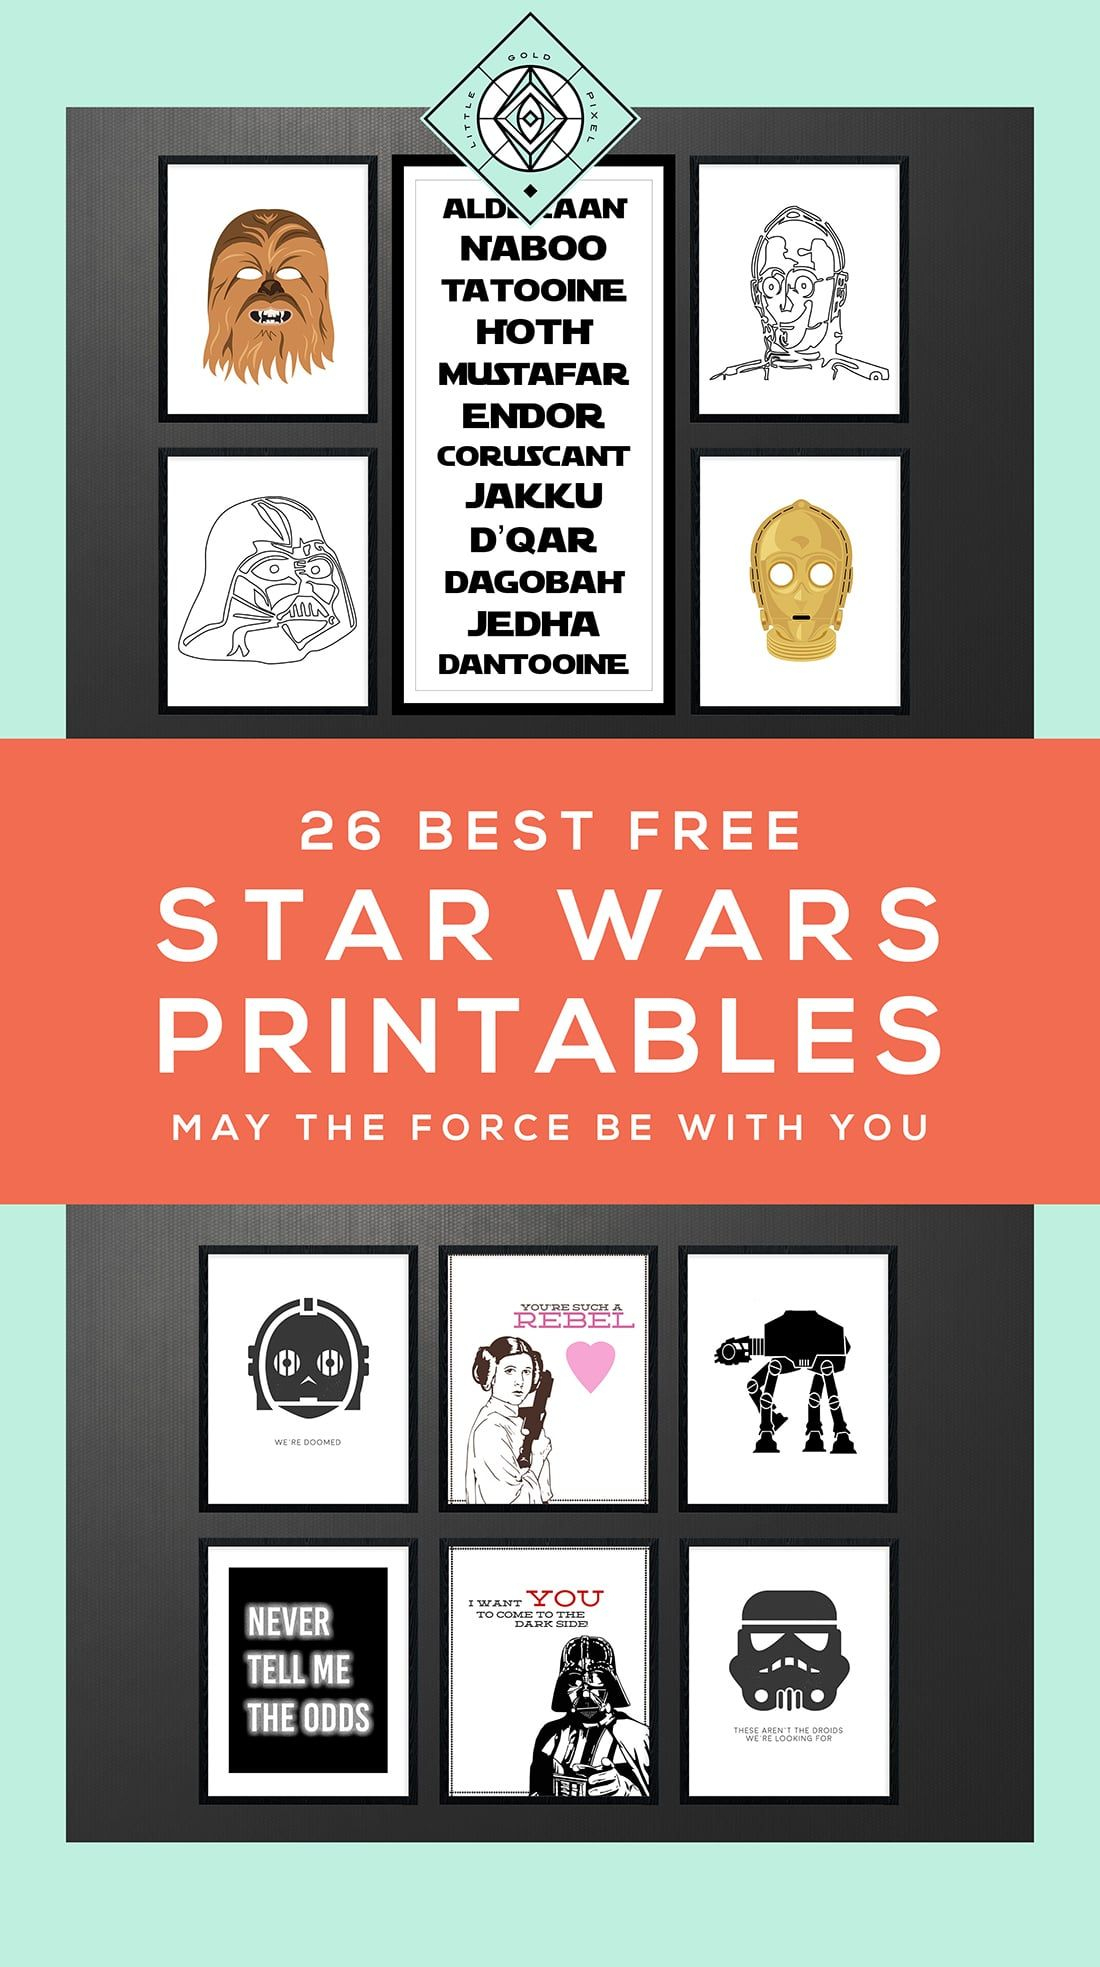 Star Wars Free Printables • A Roundup | Free Printables • Roundups - Free Printable Star Wars Baby Shower Invites